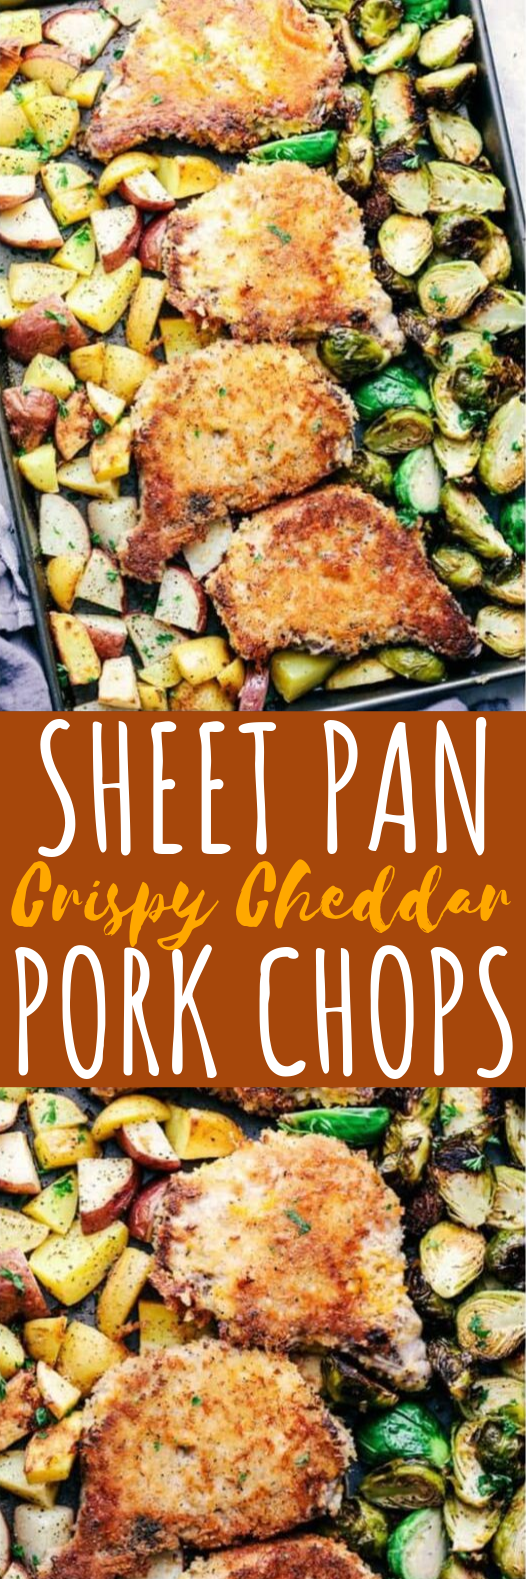 Sheet Pan Crispy Cheddar Pork Chops #dinner #pork